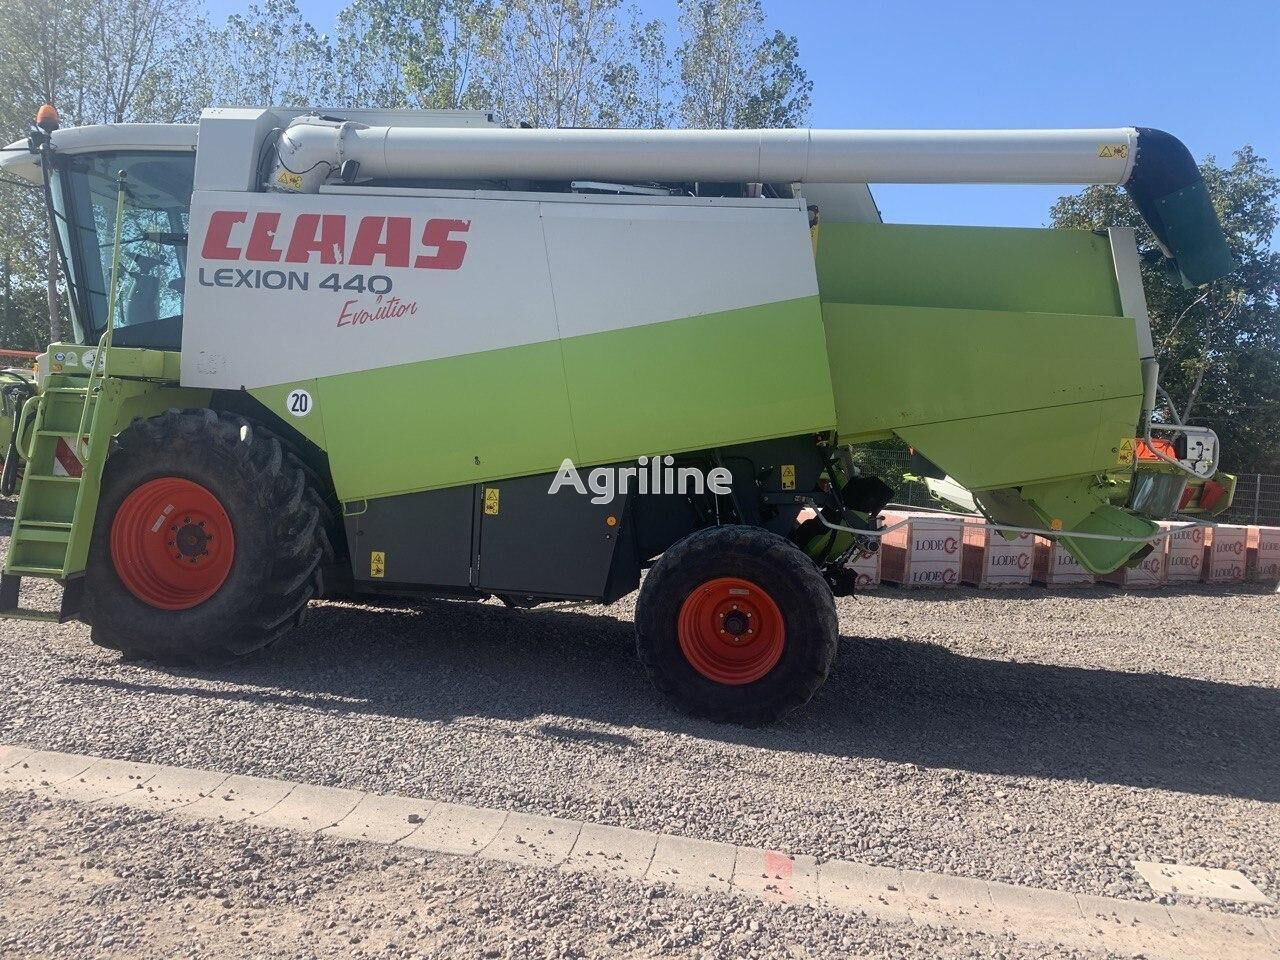 CLAAS Lexion 440 Evo grain harvester